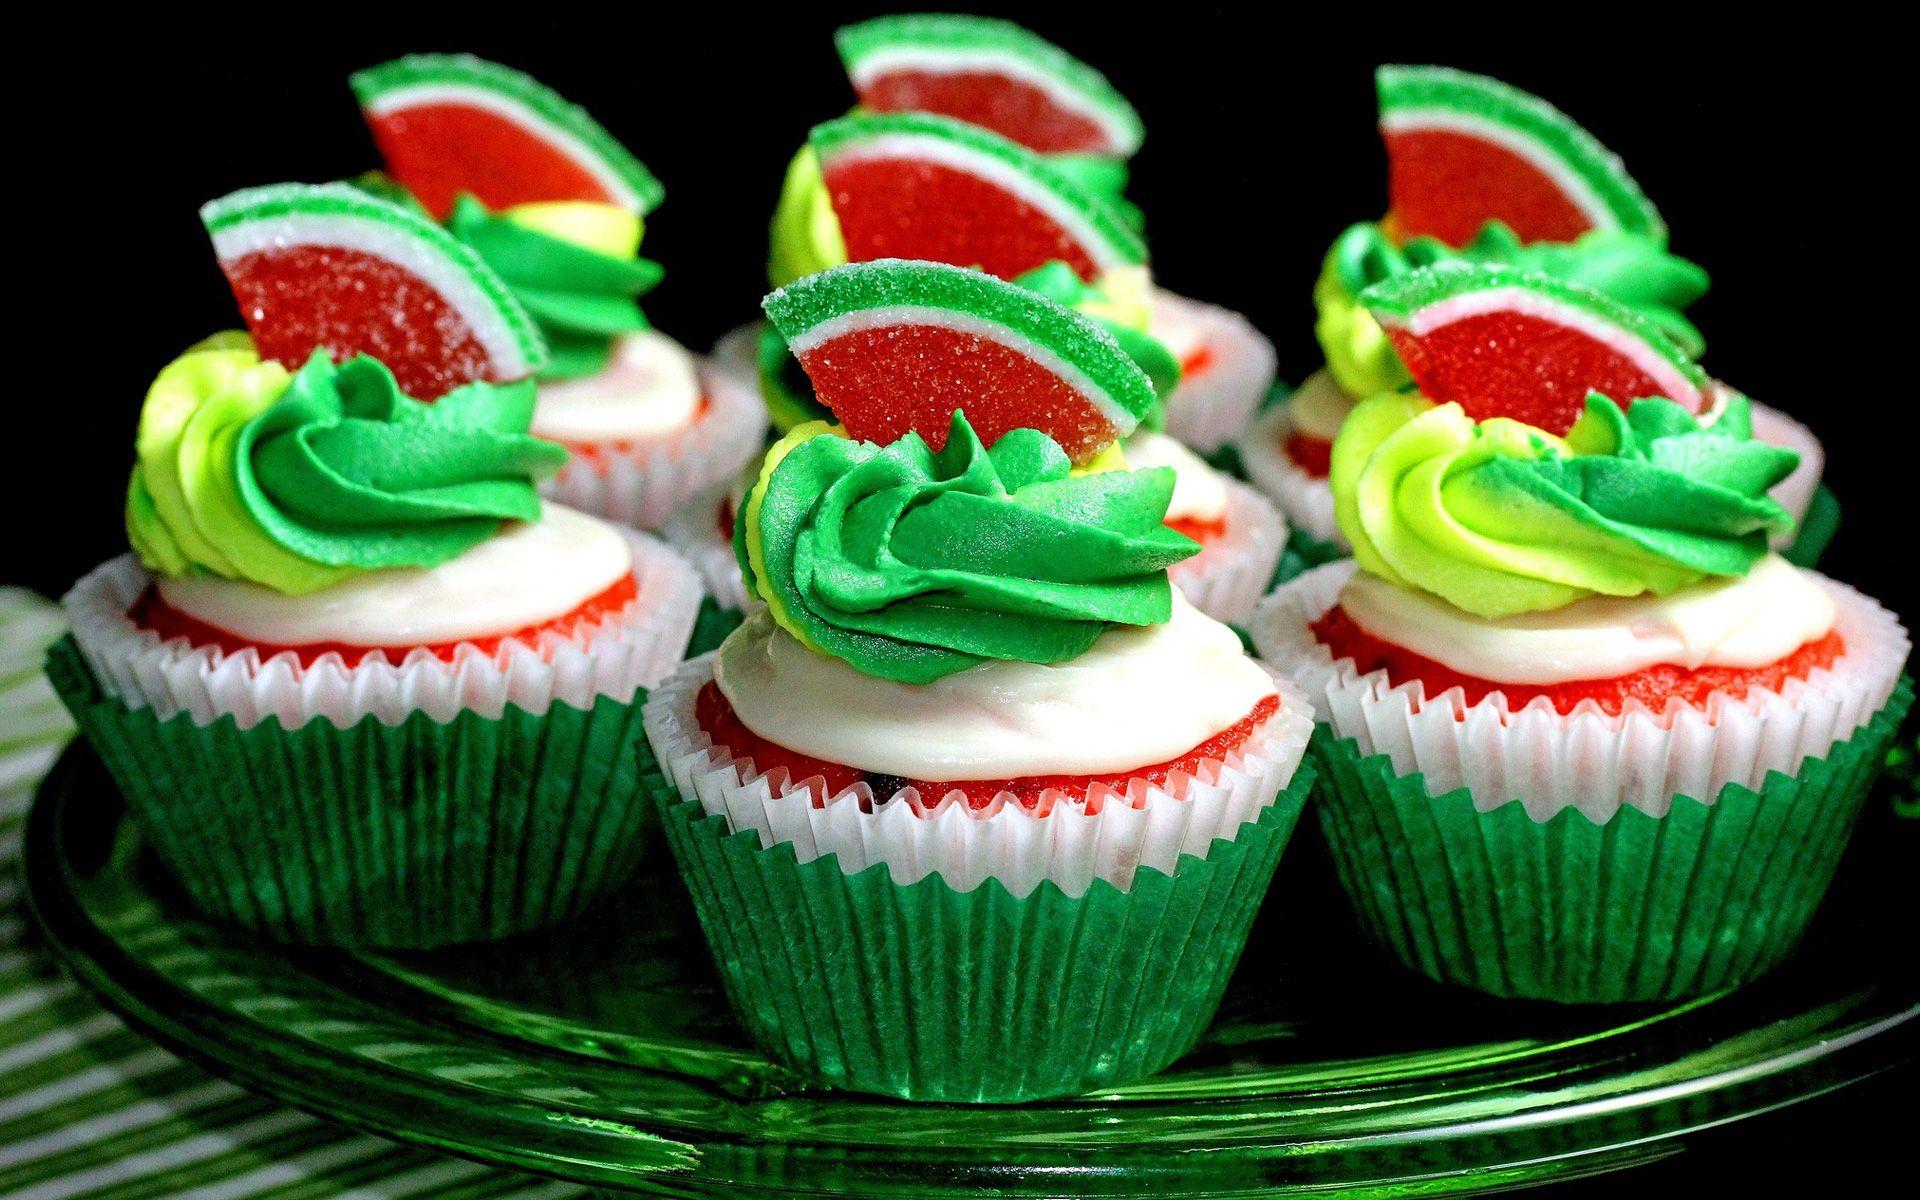 watermelon cupcake wallpaper 71077